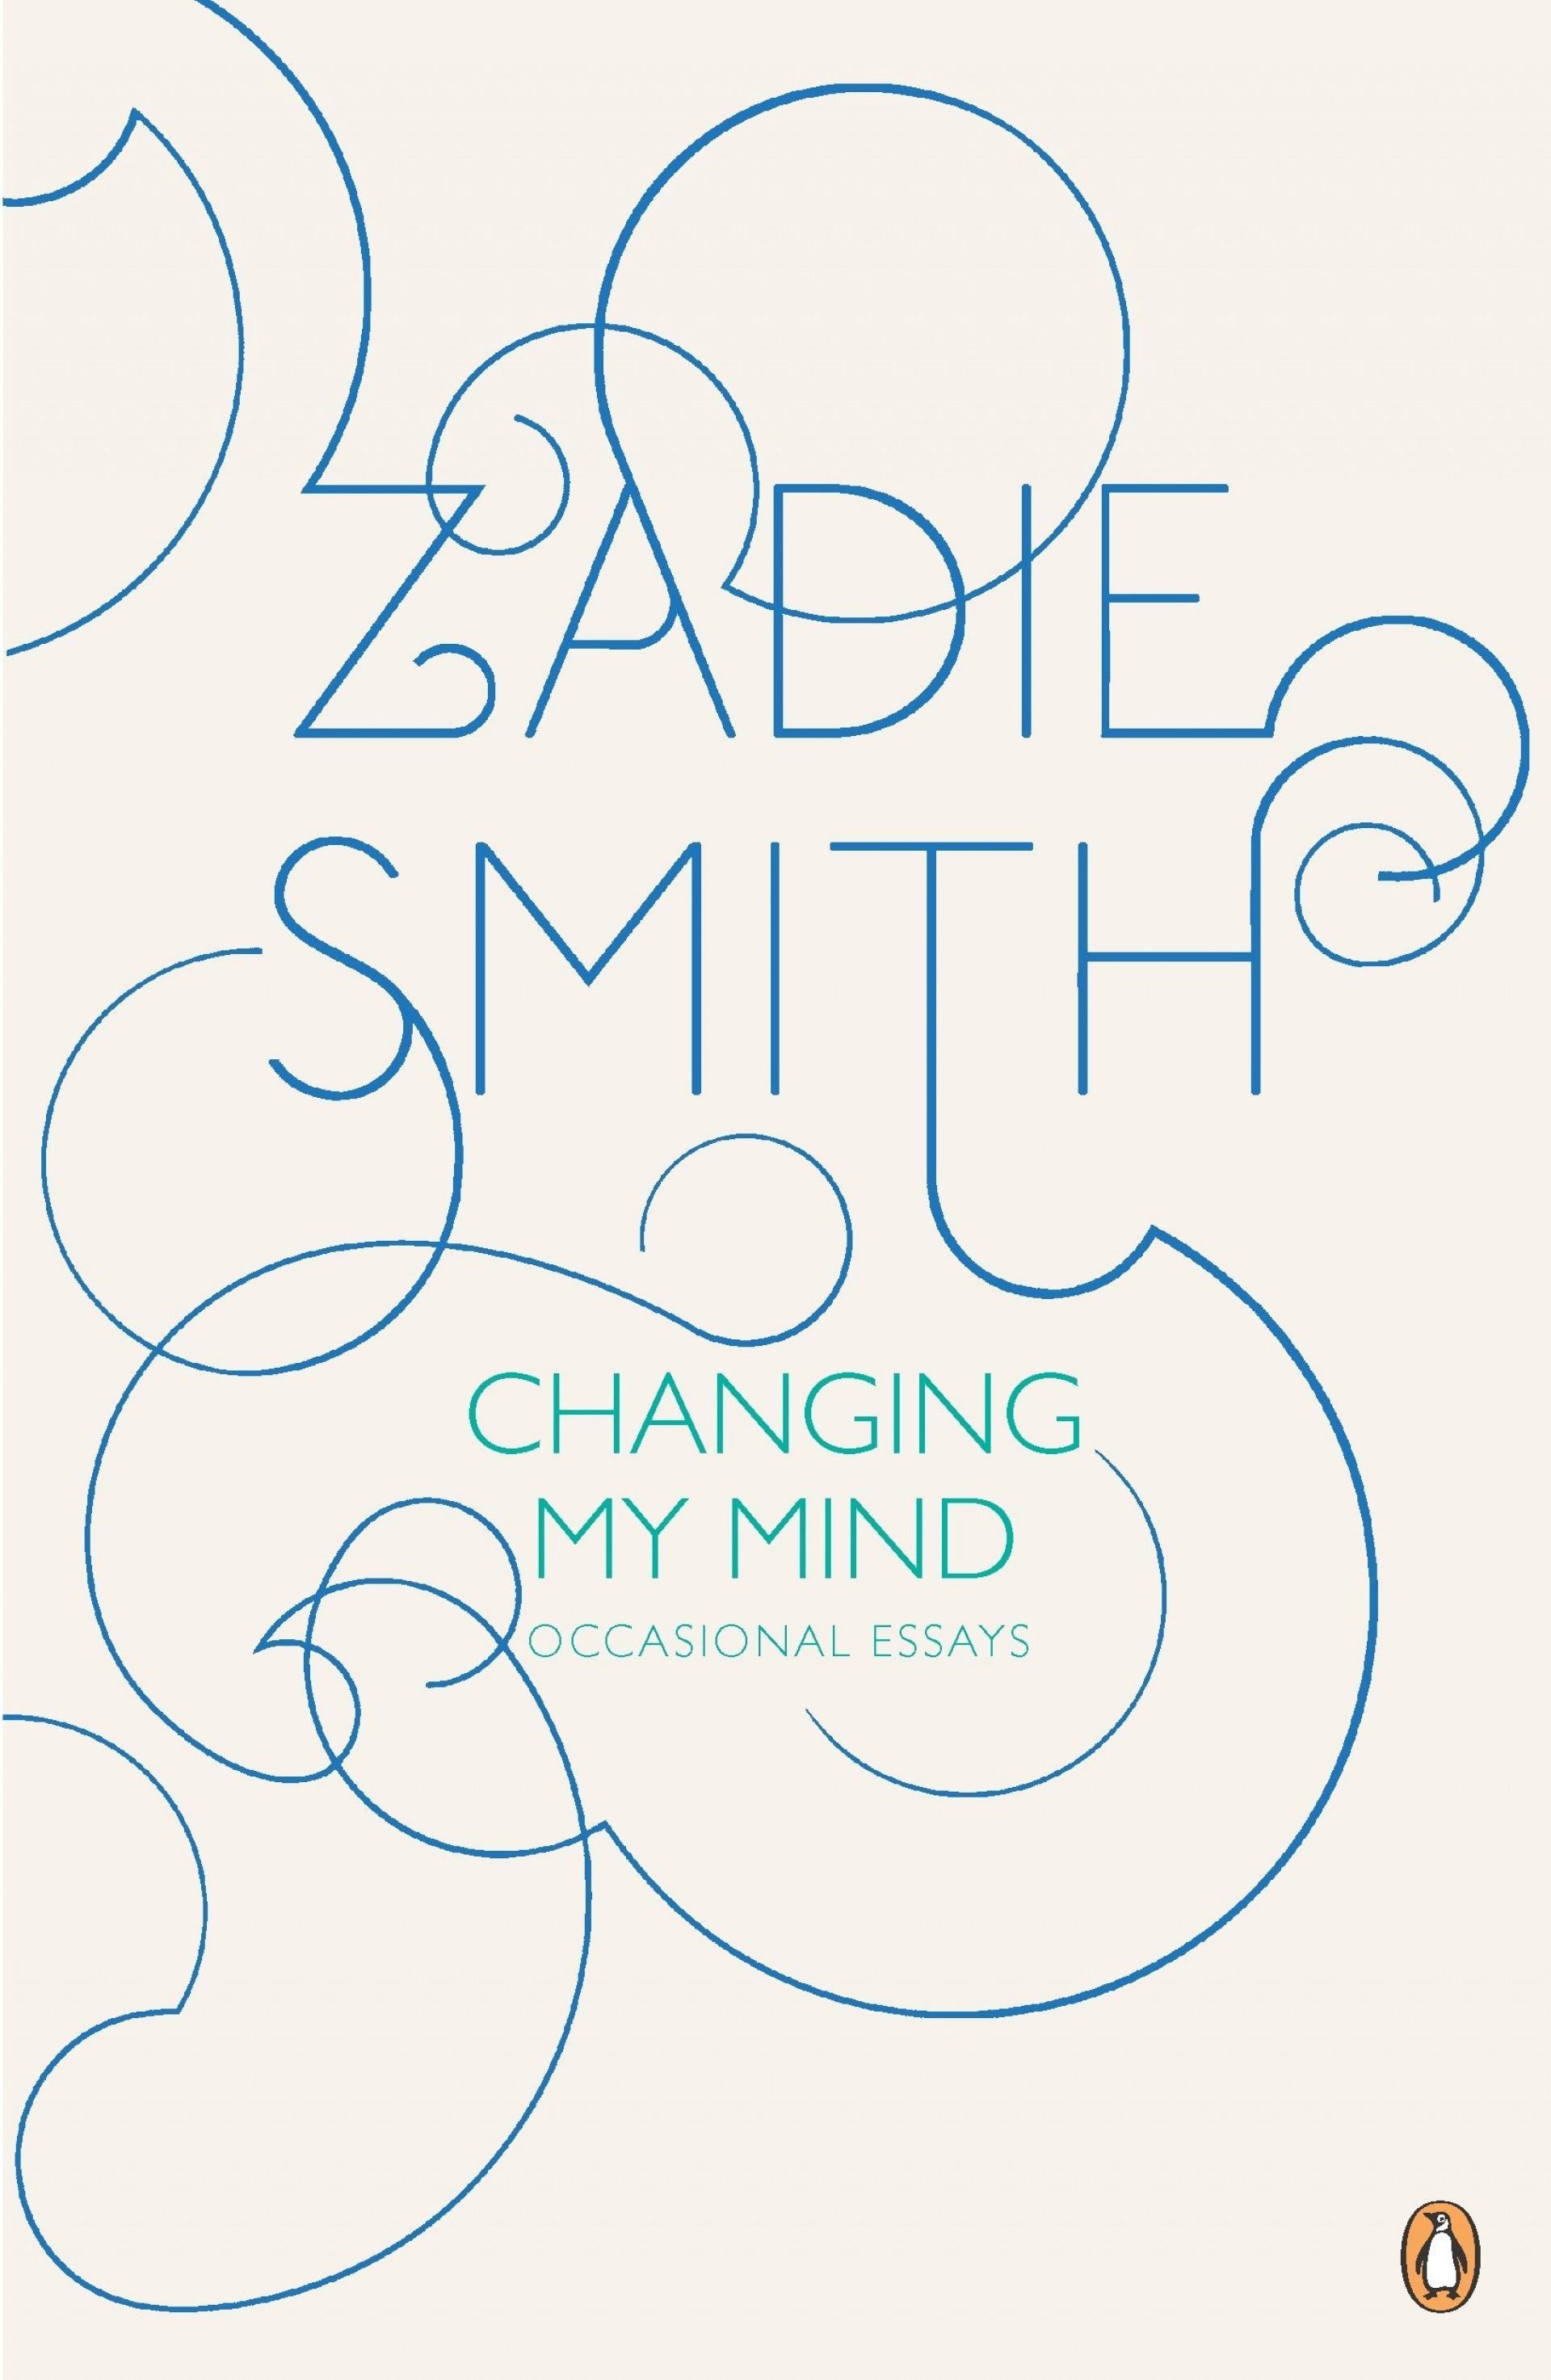 001 Essay Example Changing My Mind Occasional Essays Striking Pdf By Zadie Smith 1920